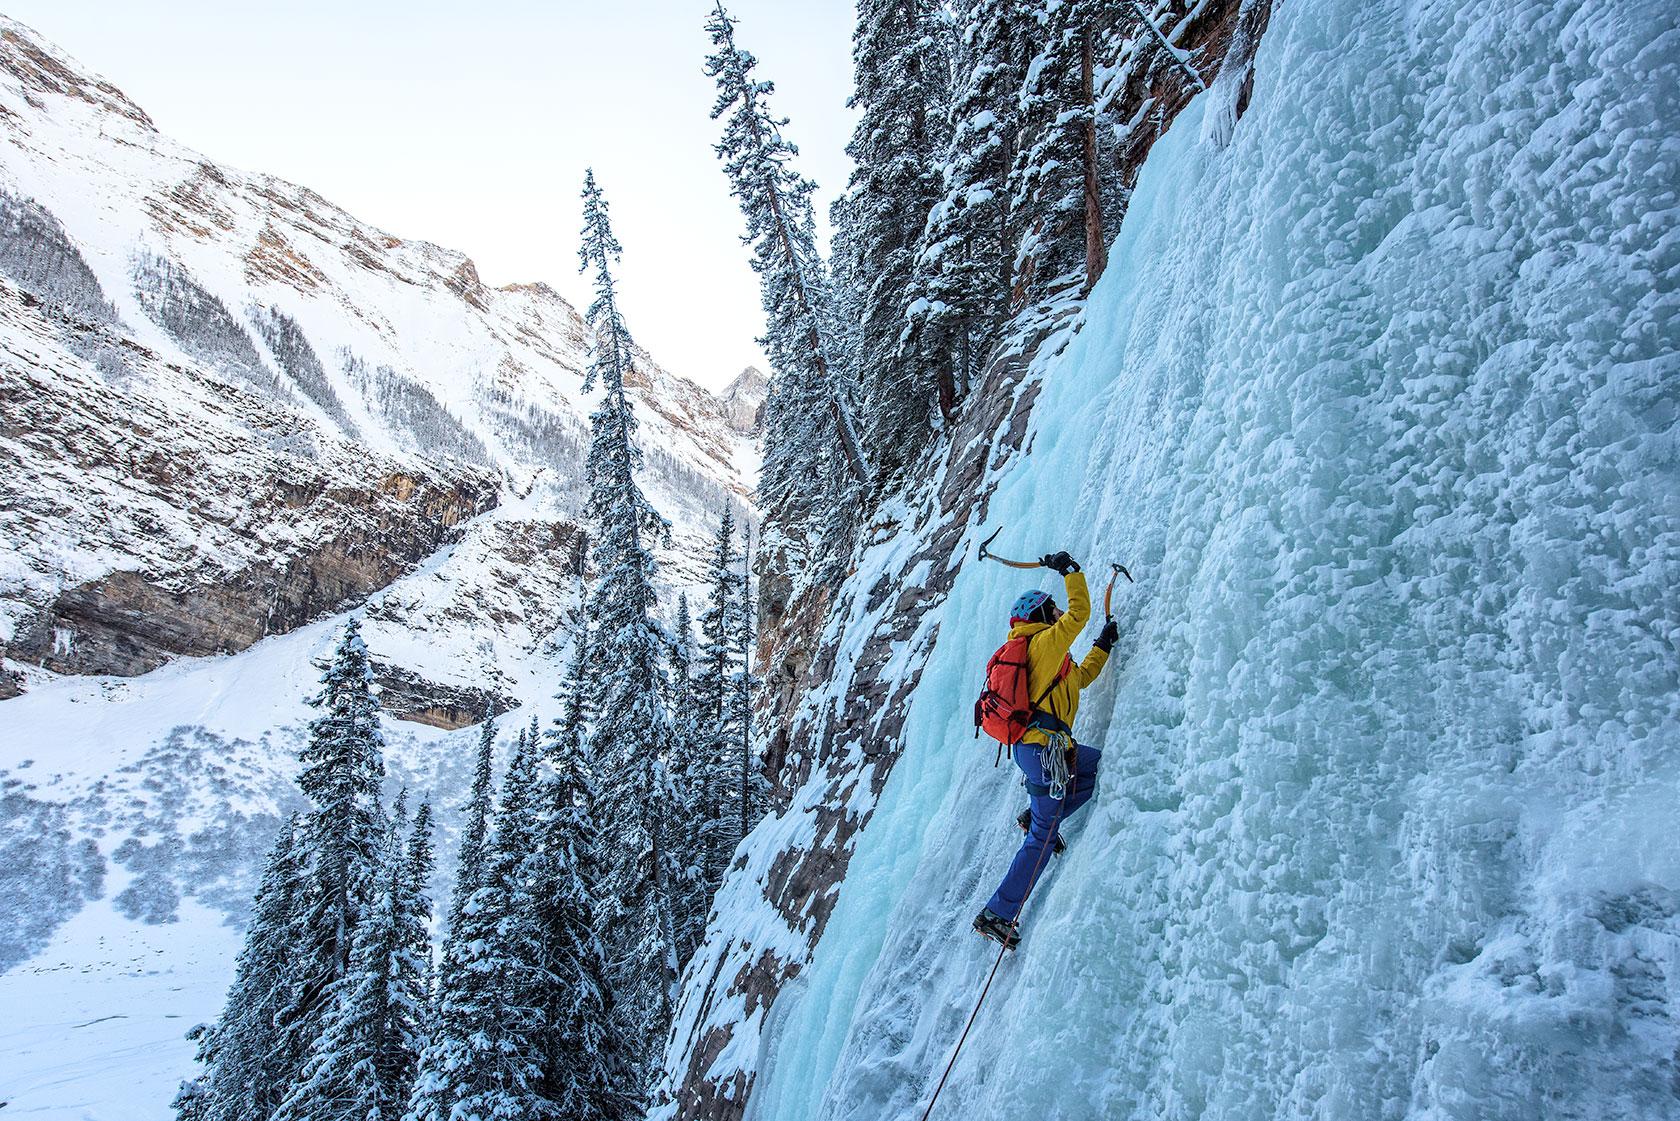 austin-trigg-patagonia-banff-alberta-winter-lake-louise-falls-waterfall-ice-climbing-mountains-snow-ax-adventure-outside.jpg